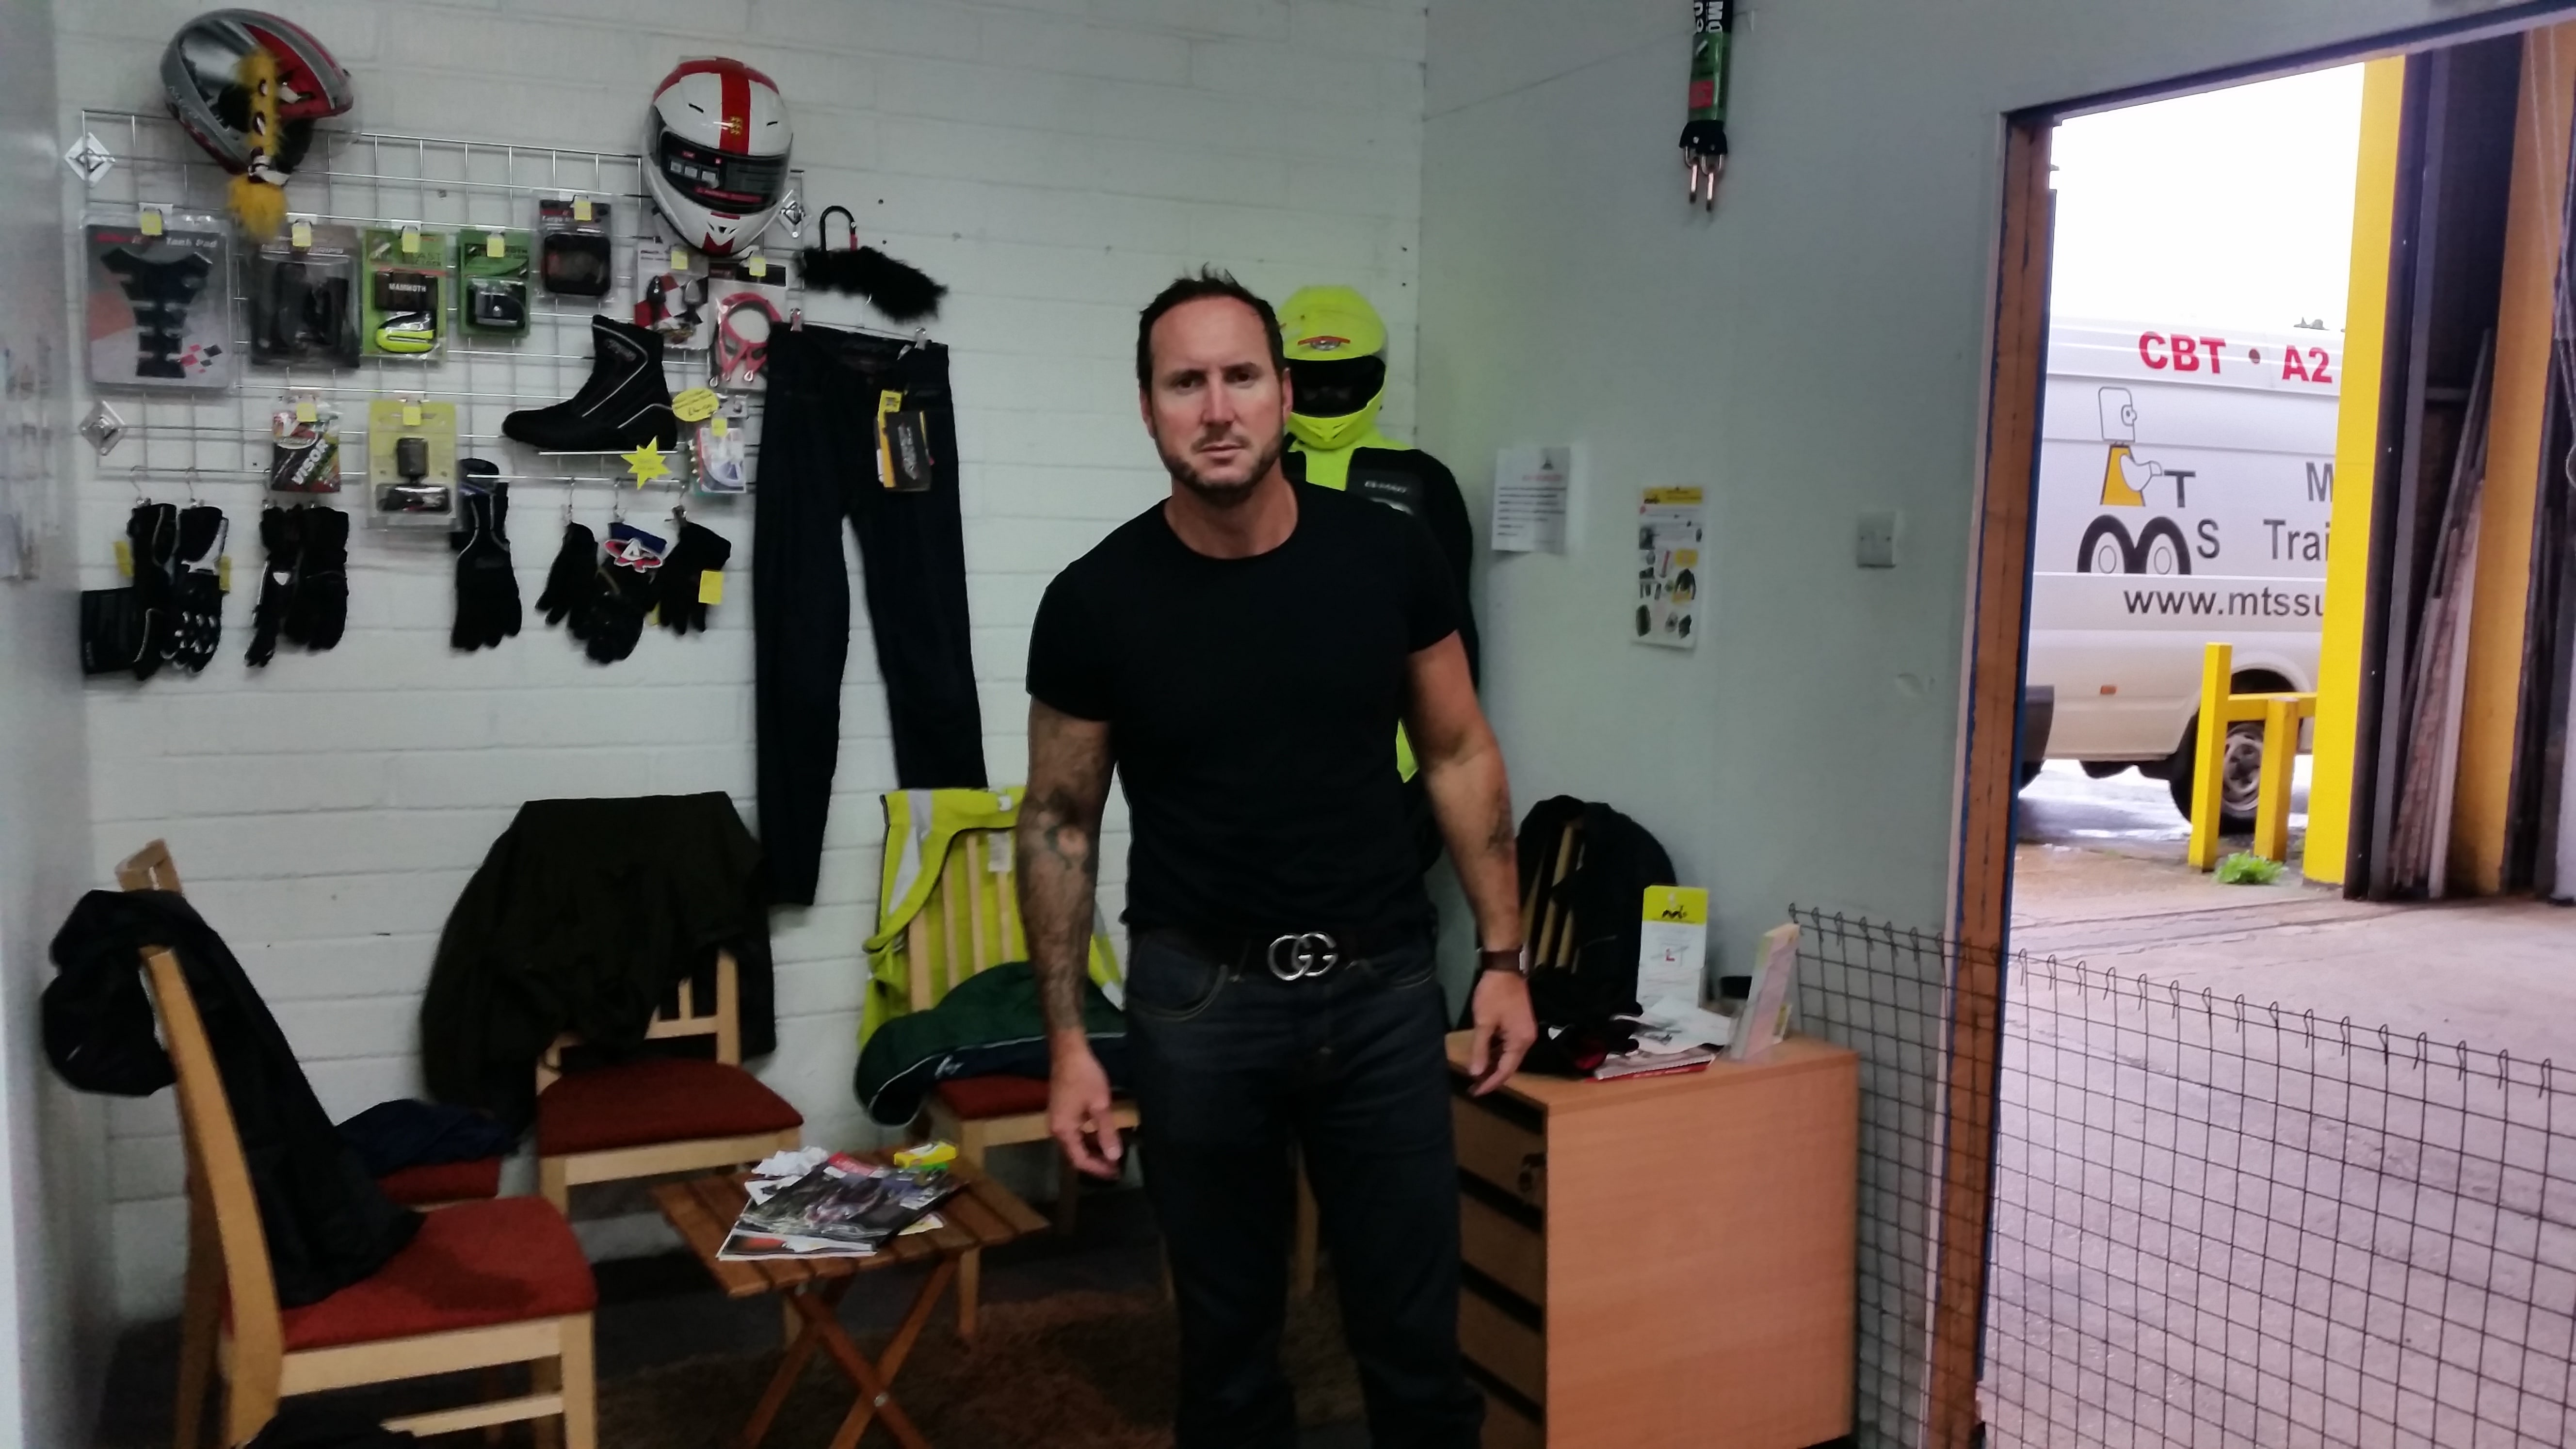 Another Brighton biker free to ride!